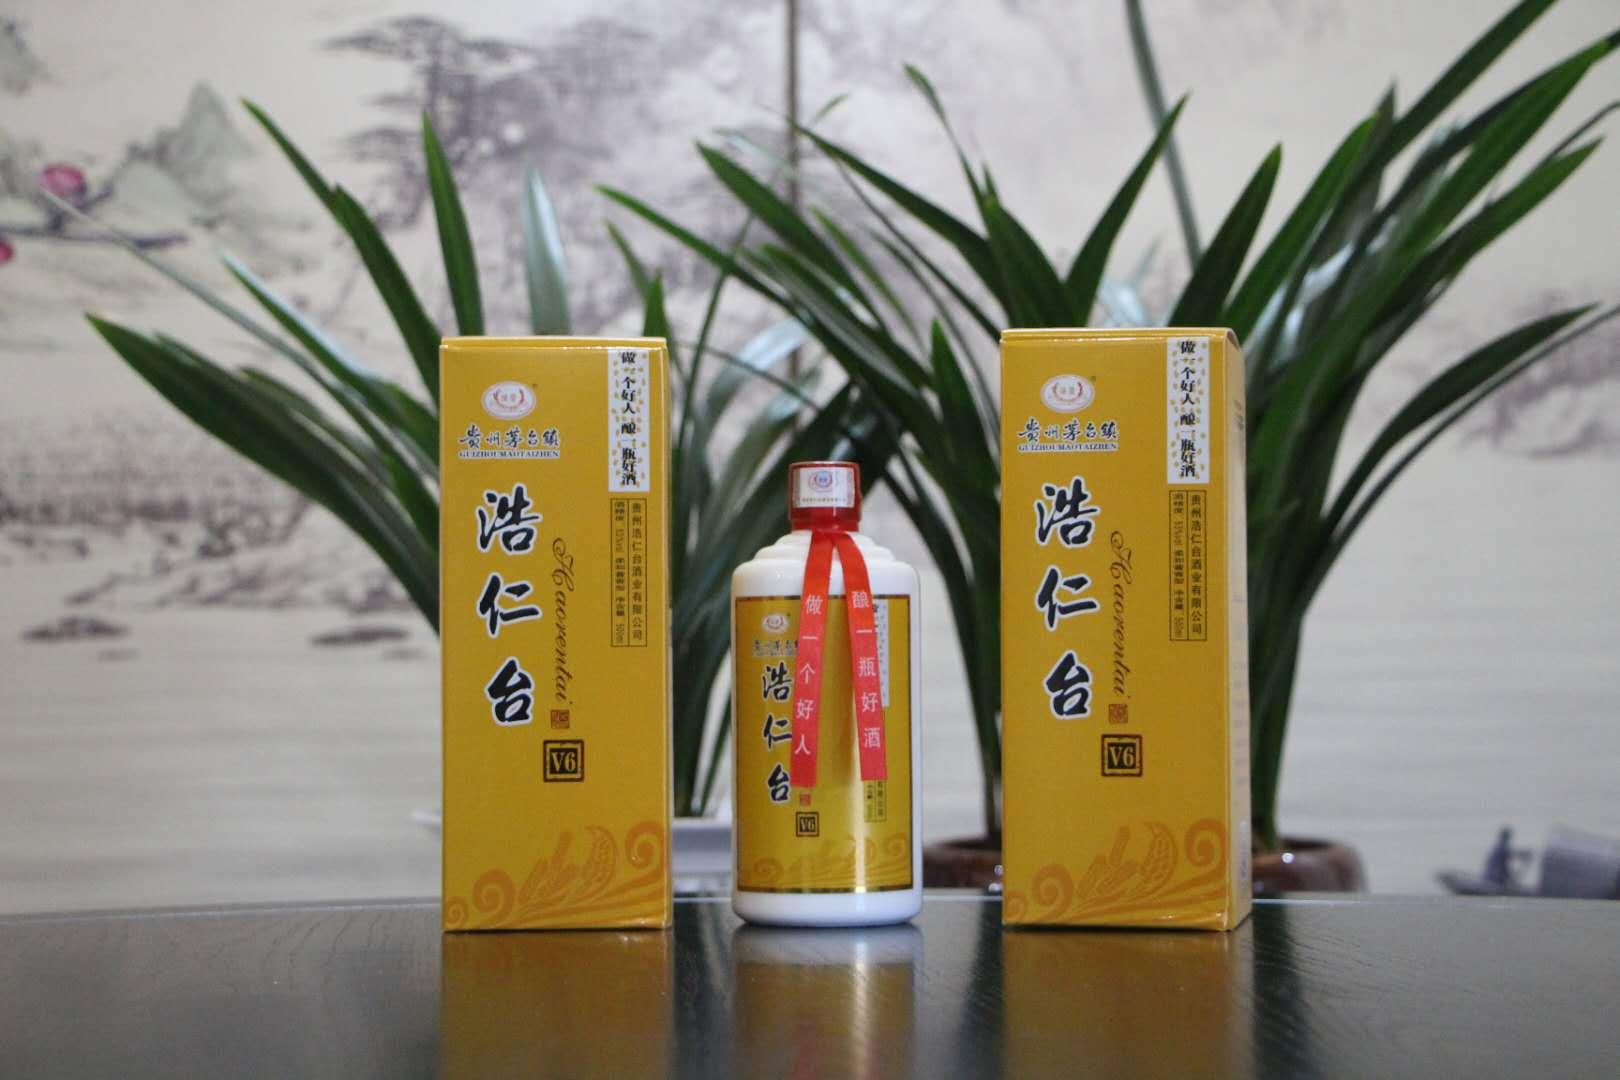 title='浩仁台V6'